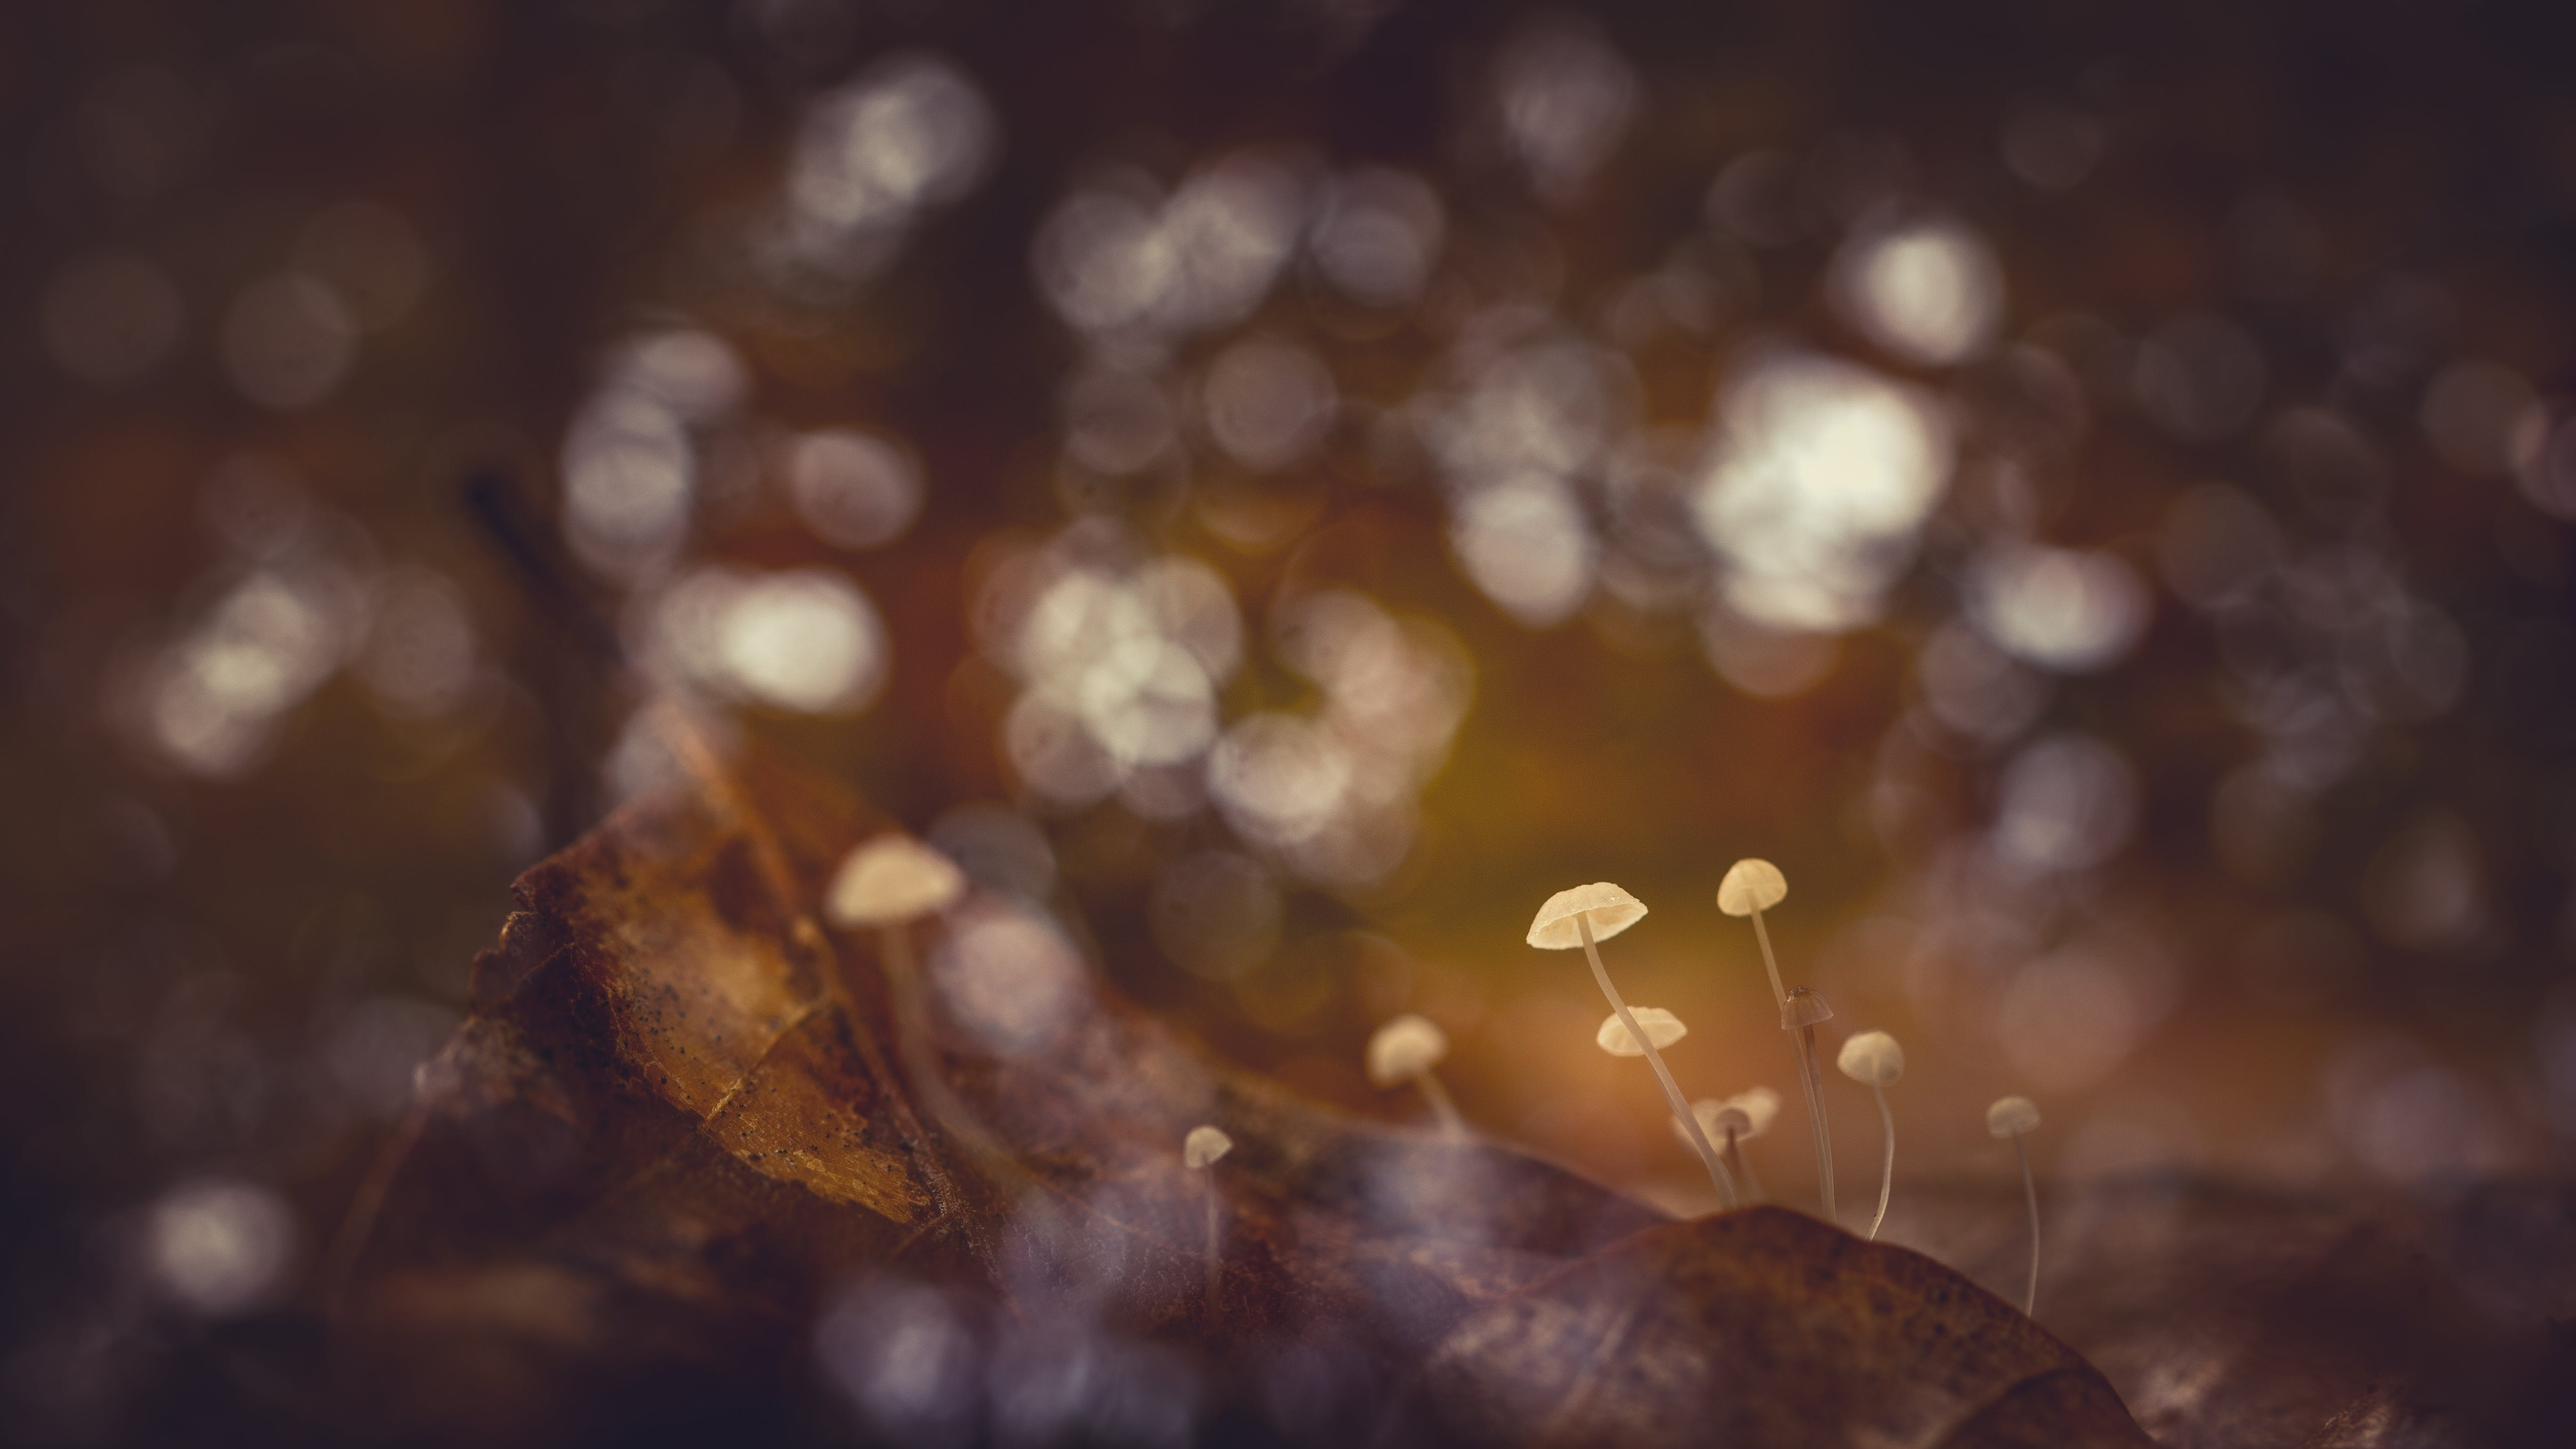 Closeup and Selective Focus Photography of Mushrooms